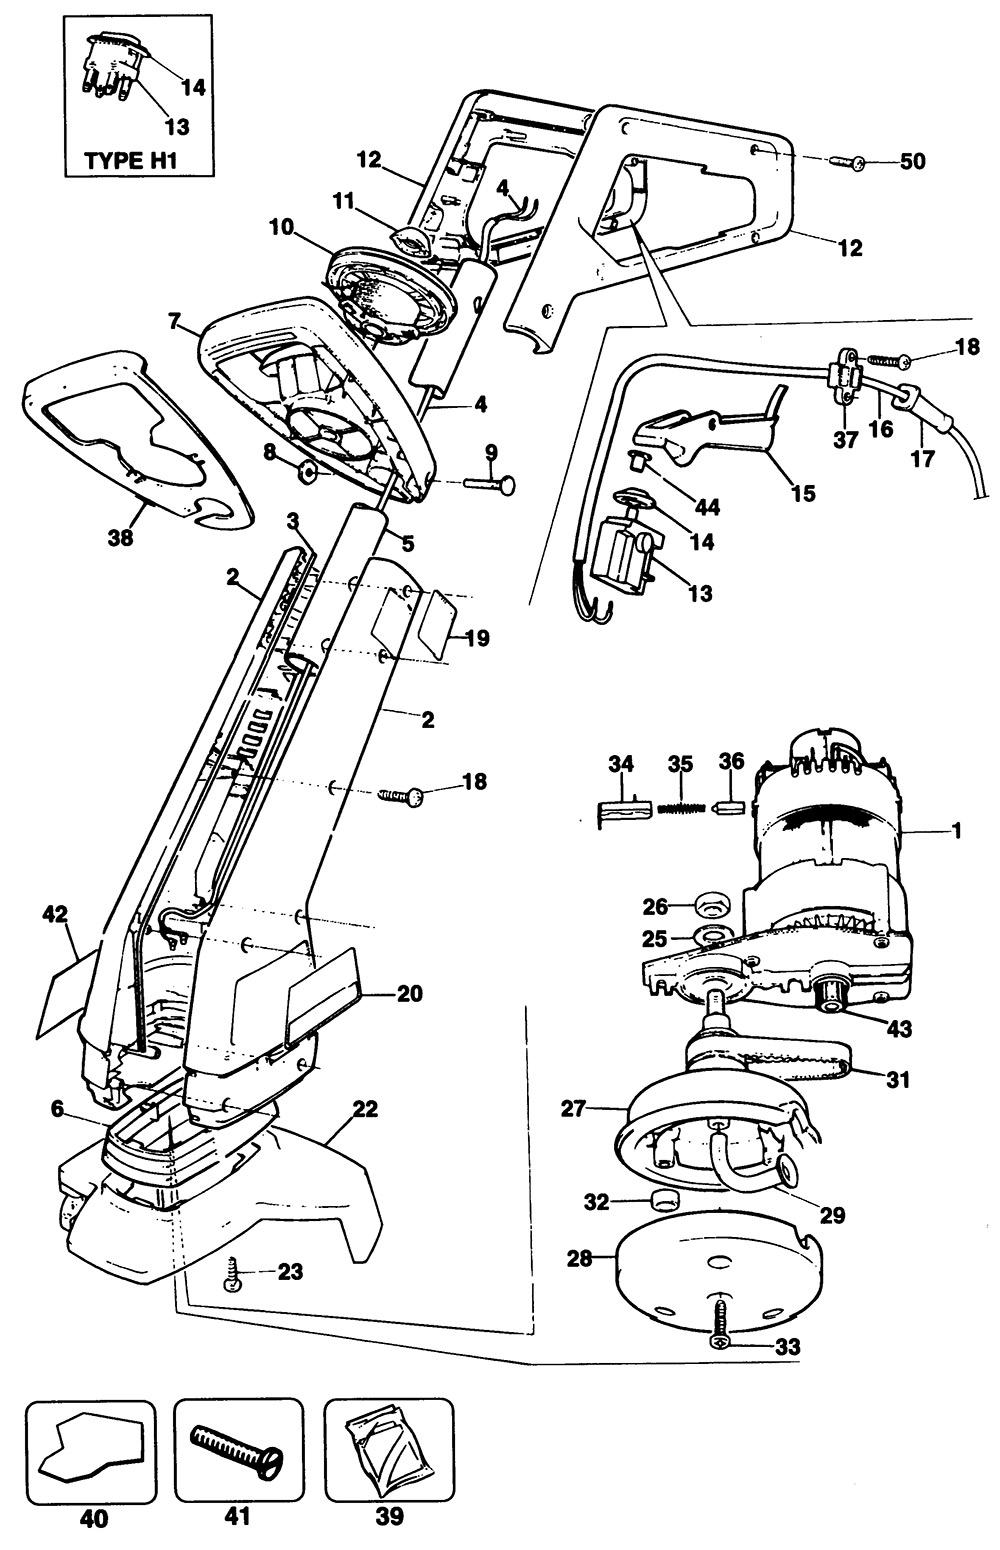 Black & Decker GL620 Type 1 String Trimmer Spare Parts